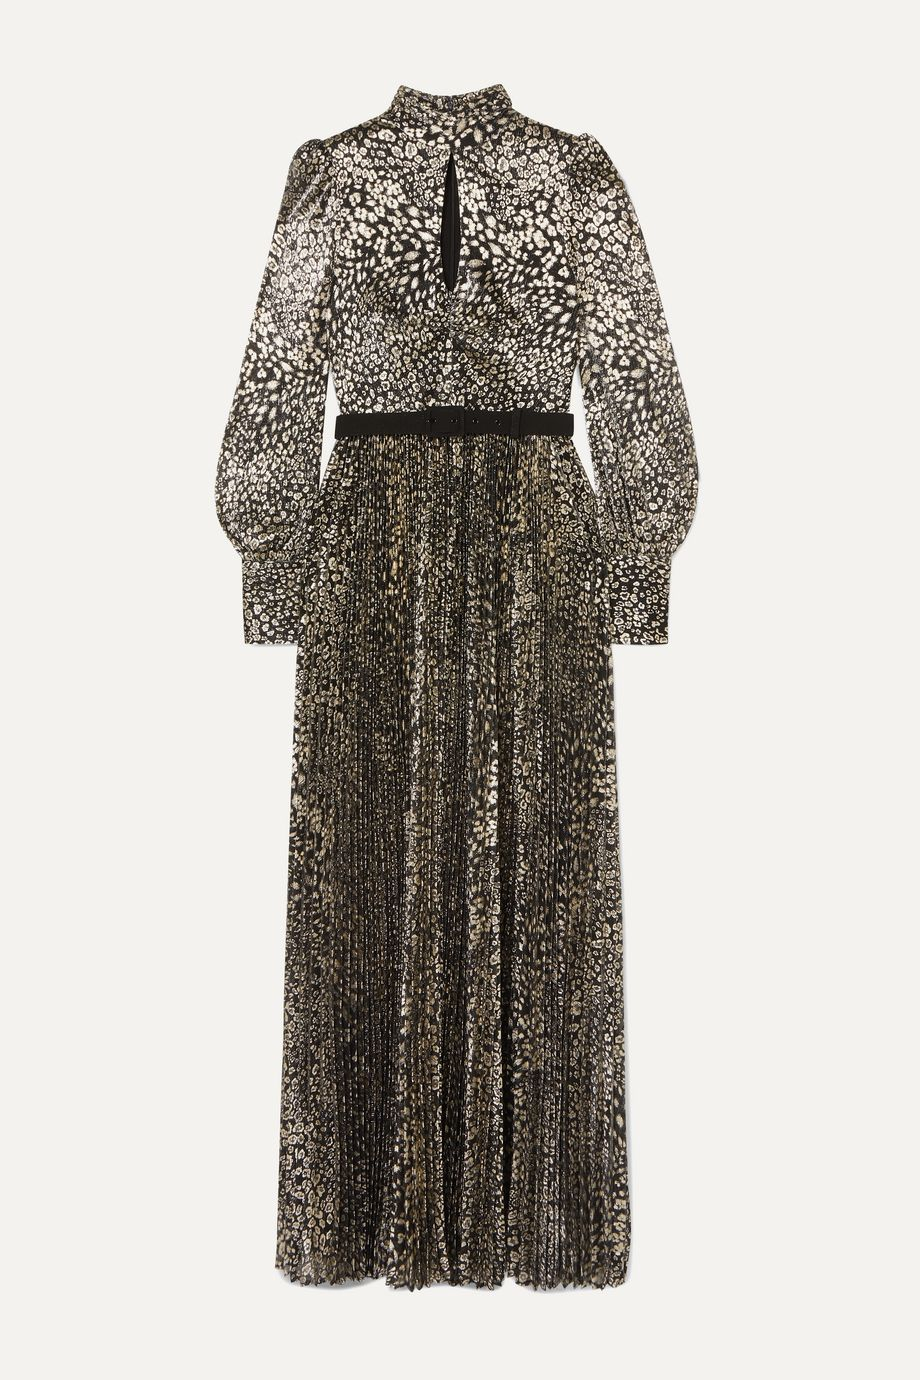 Rebecca Vallance Vienna tie-detailed belted leopard-jacquard maxi dress